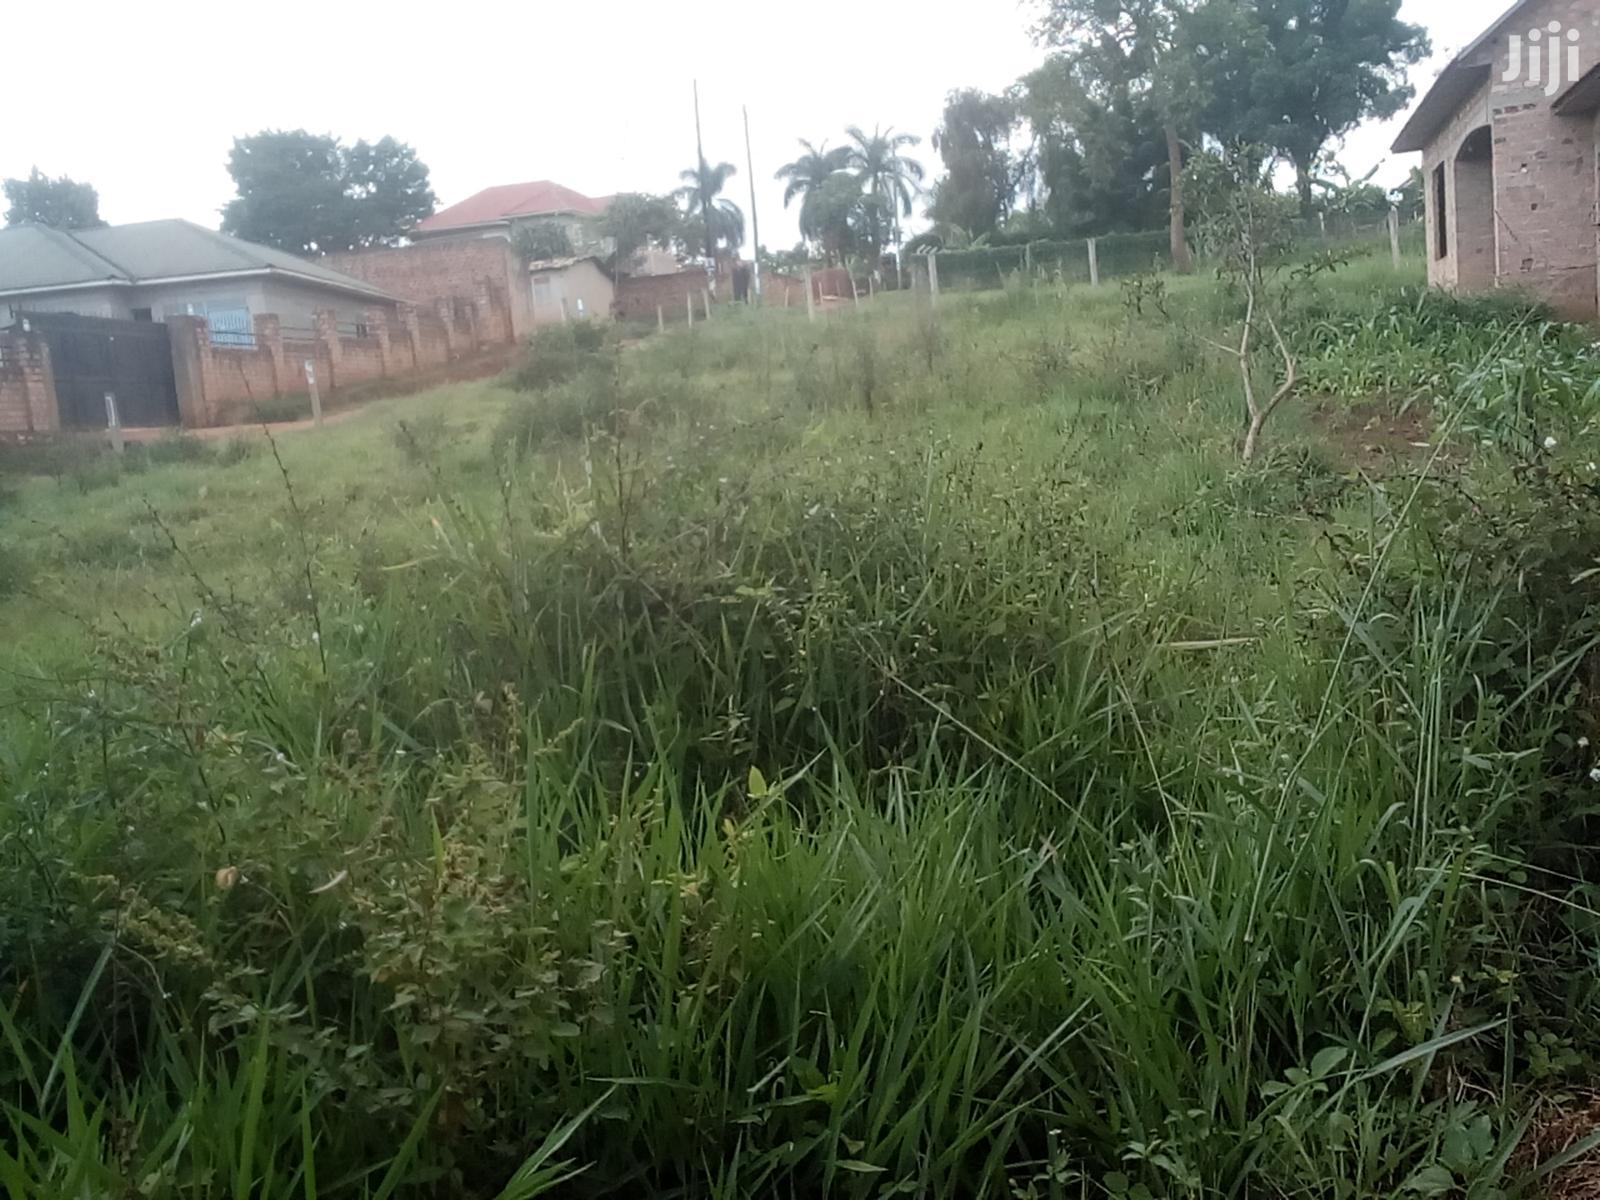 Cheap 50x100 Land In Kirinya Along Bukasa Road For Sale | Land & Plots For Sale for sale in Kampala, Central Region, Uganda